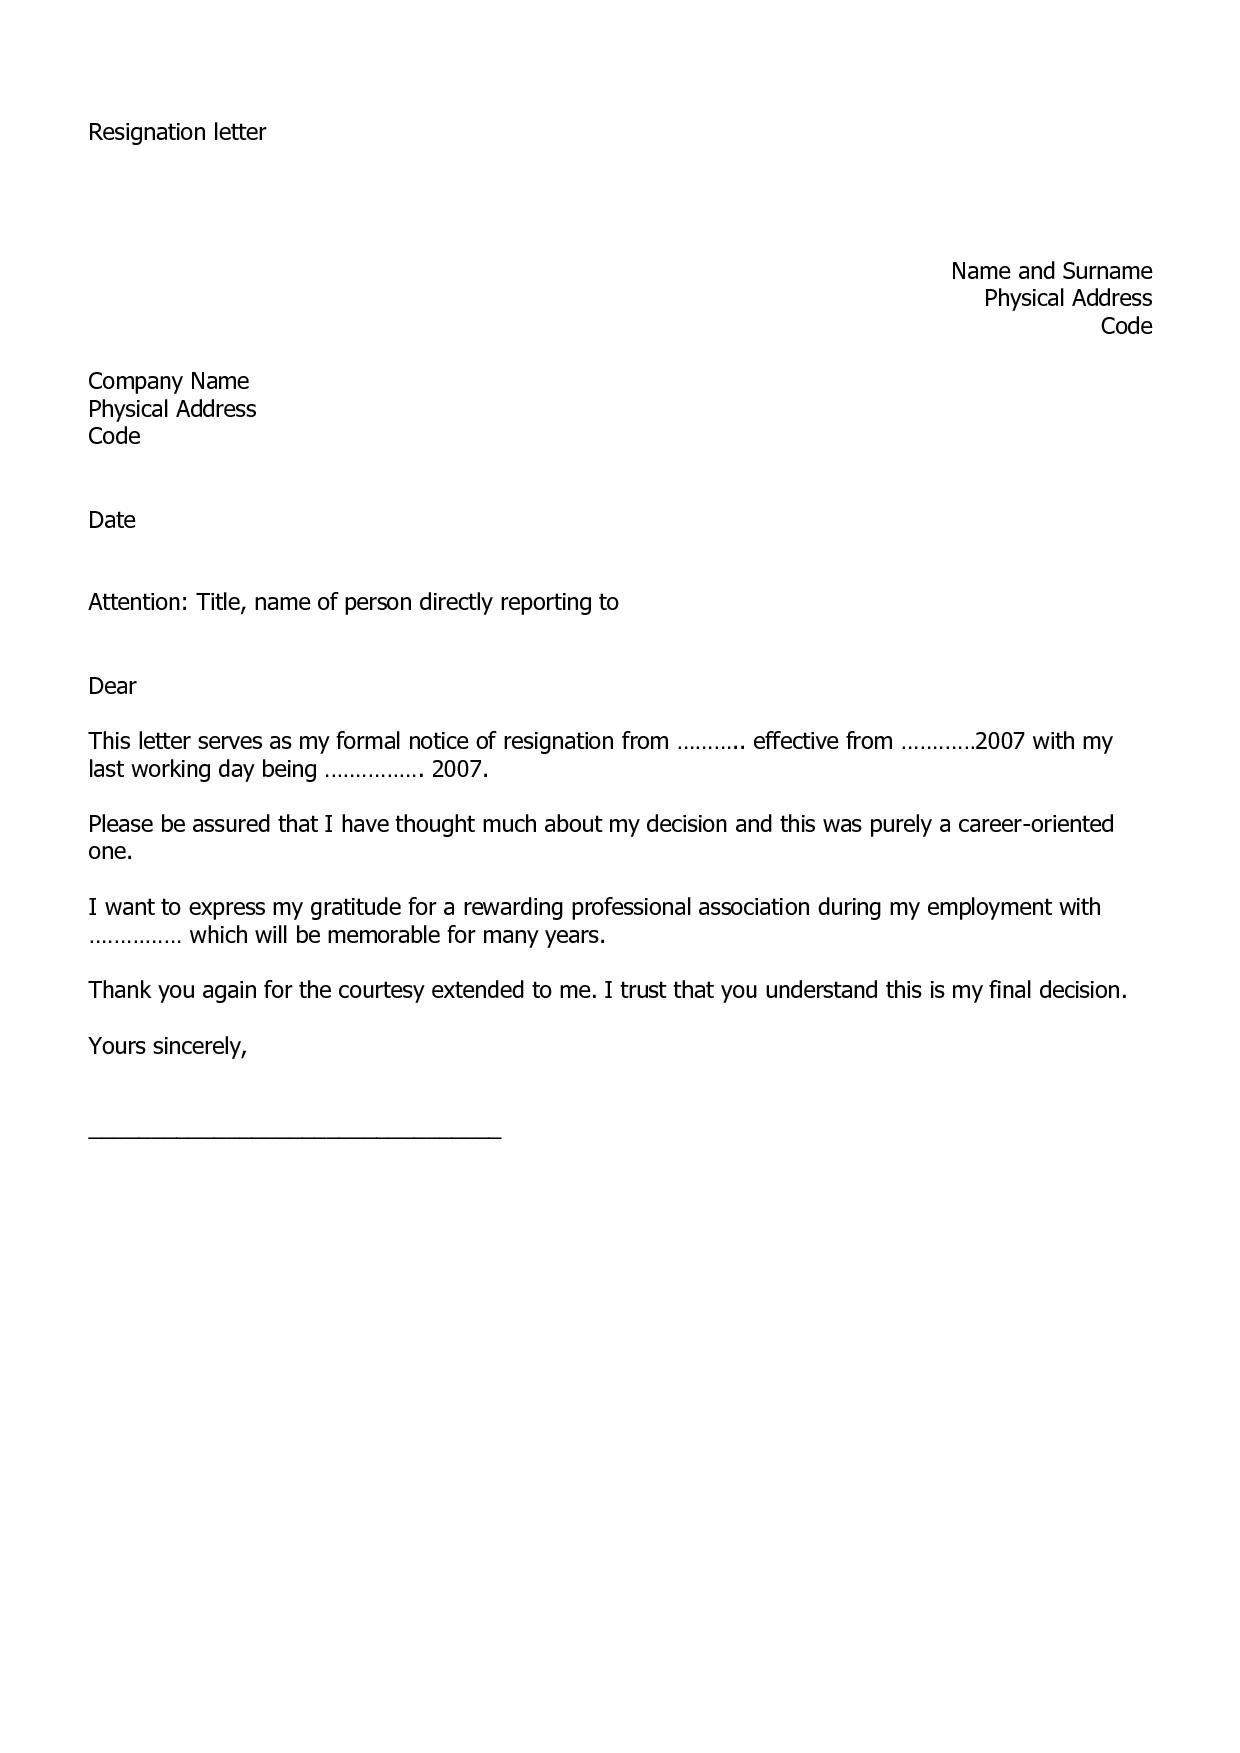 Resignation Letter Examples  Masks    Resignation